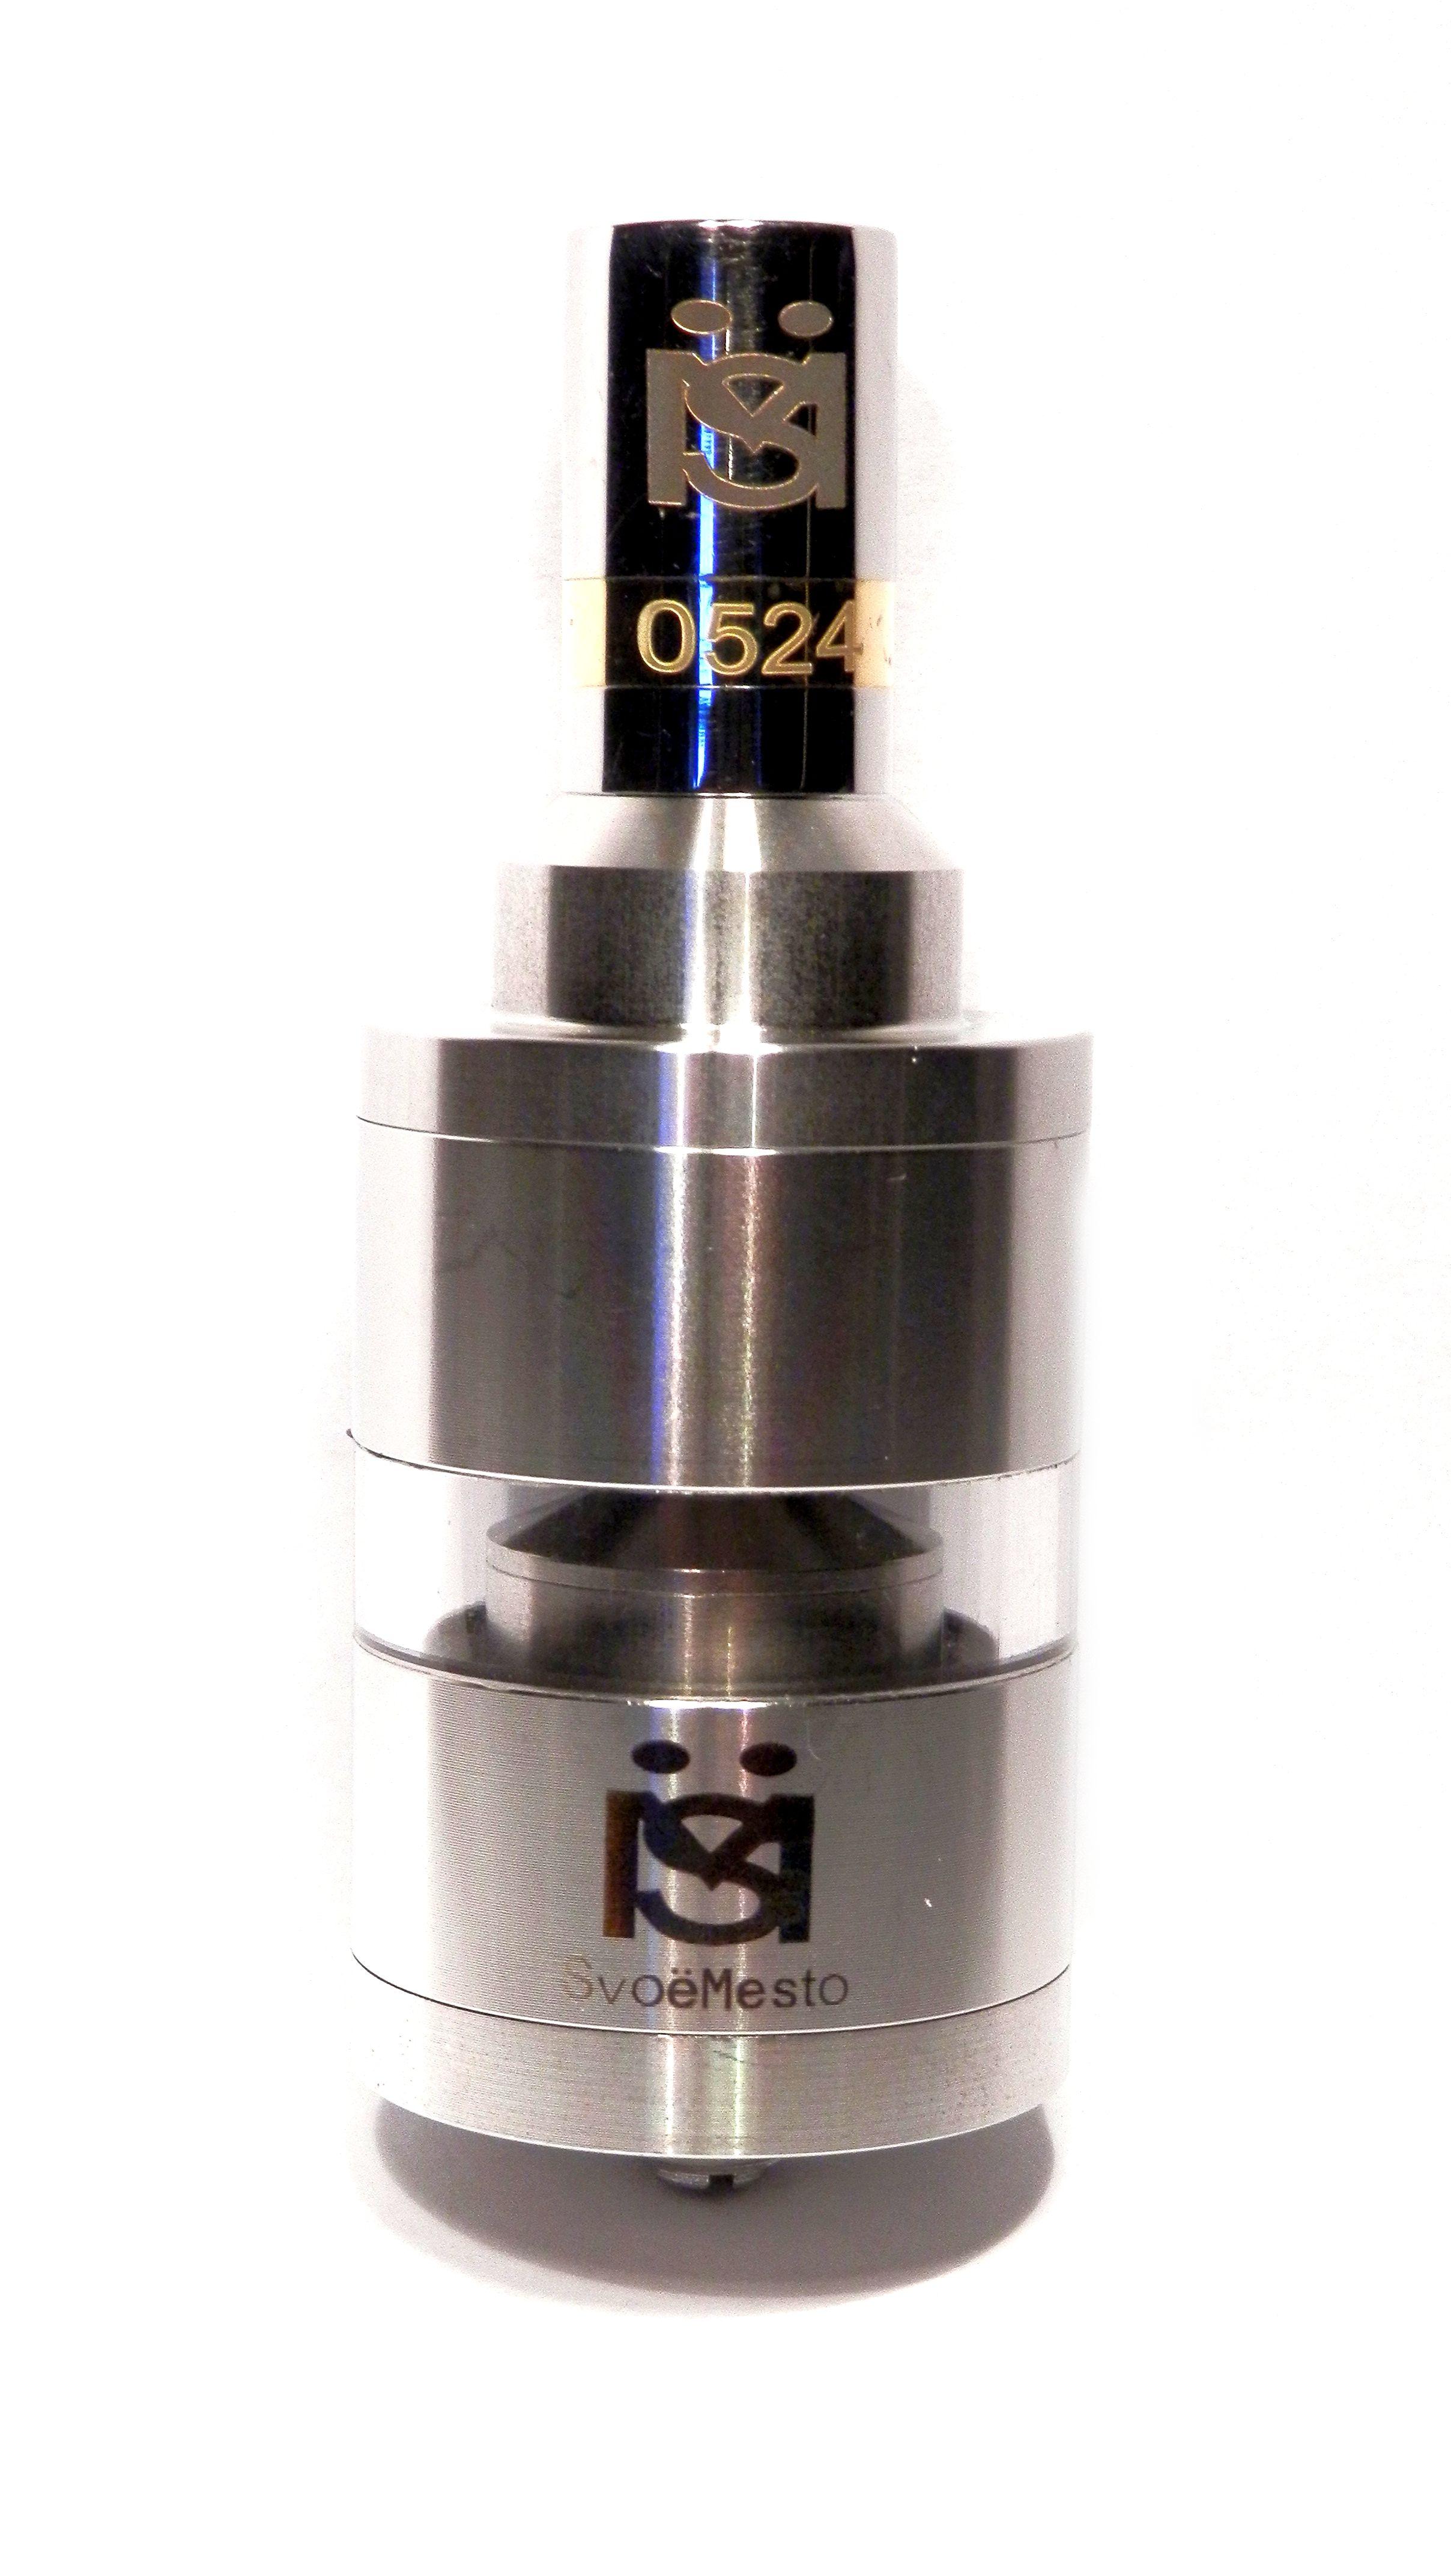 Big 30 mm Kayfun Lite Clone rebuildable atomizer RBA http://stores.ebay